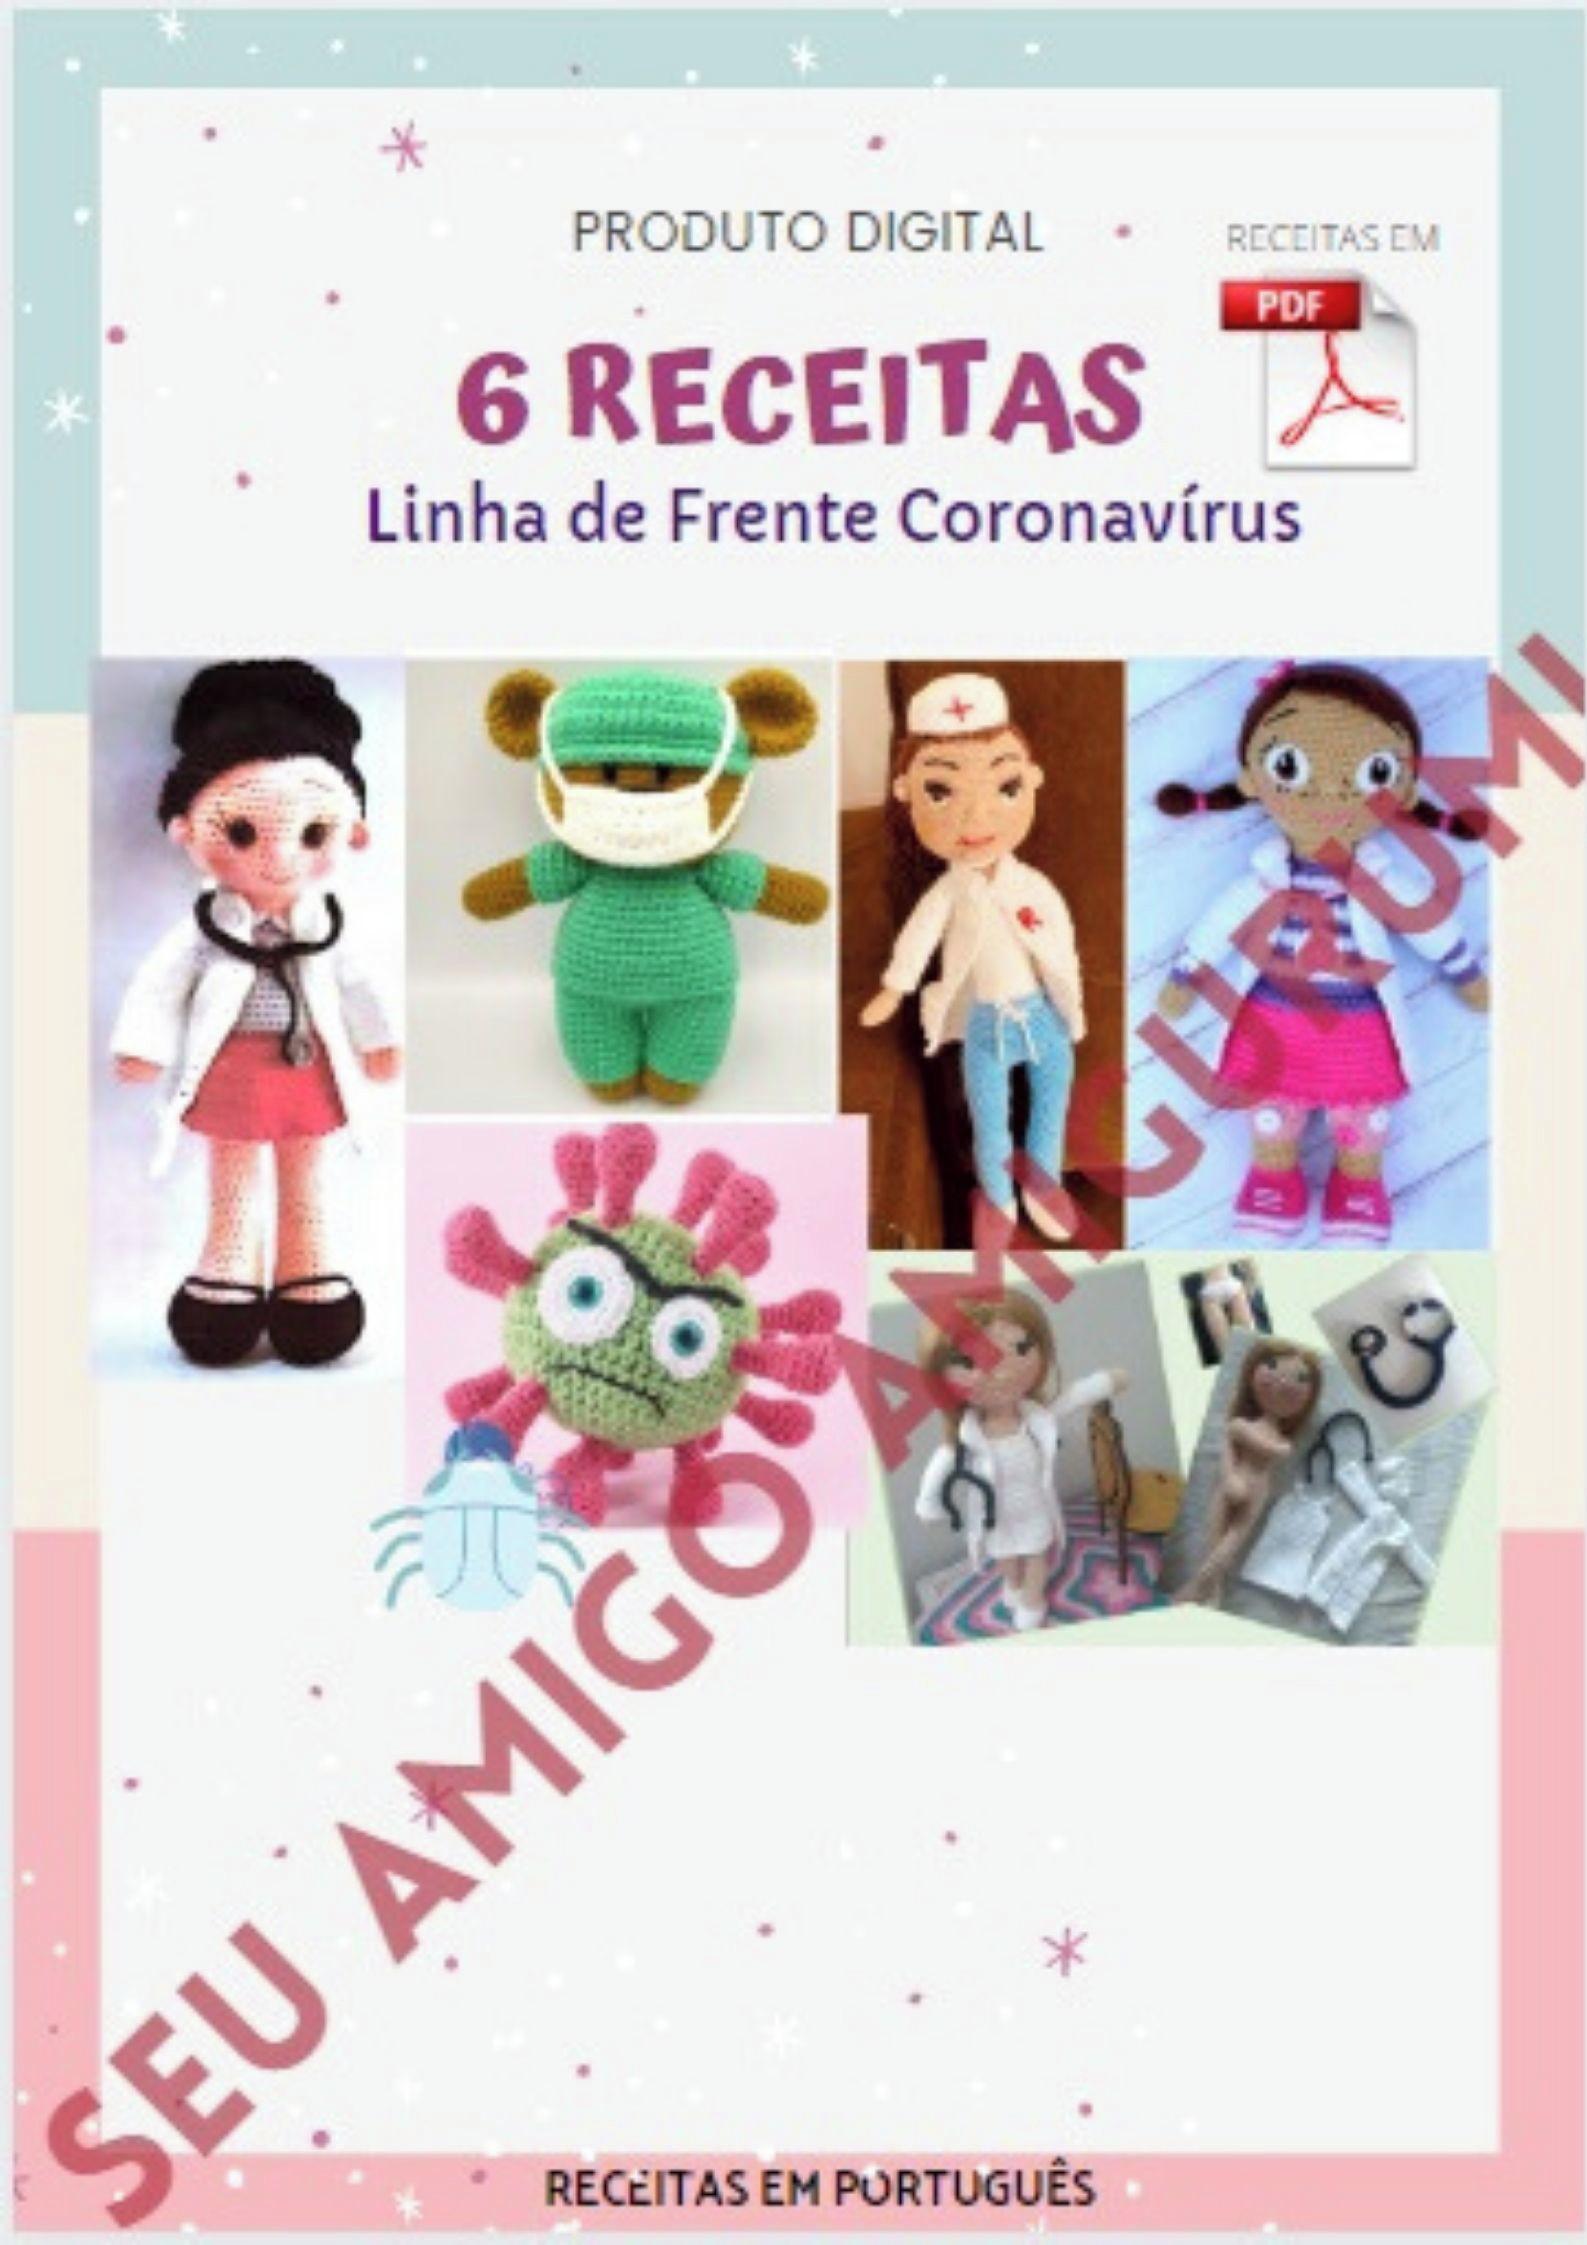 Receitas Amigurumi - Photos   Facebook   2245x1587